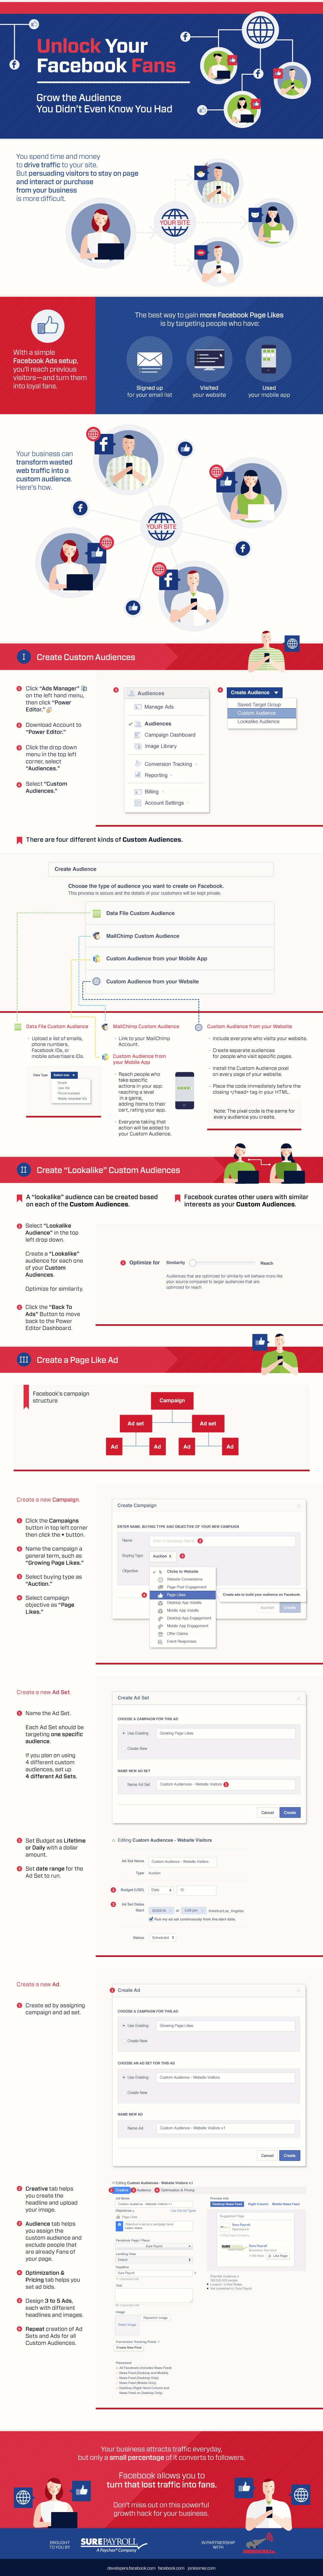 Facebook-Ad-Infographic